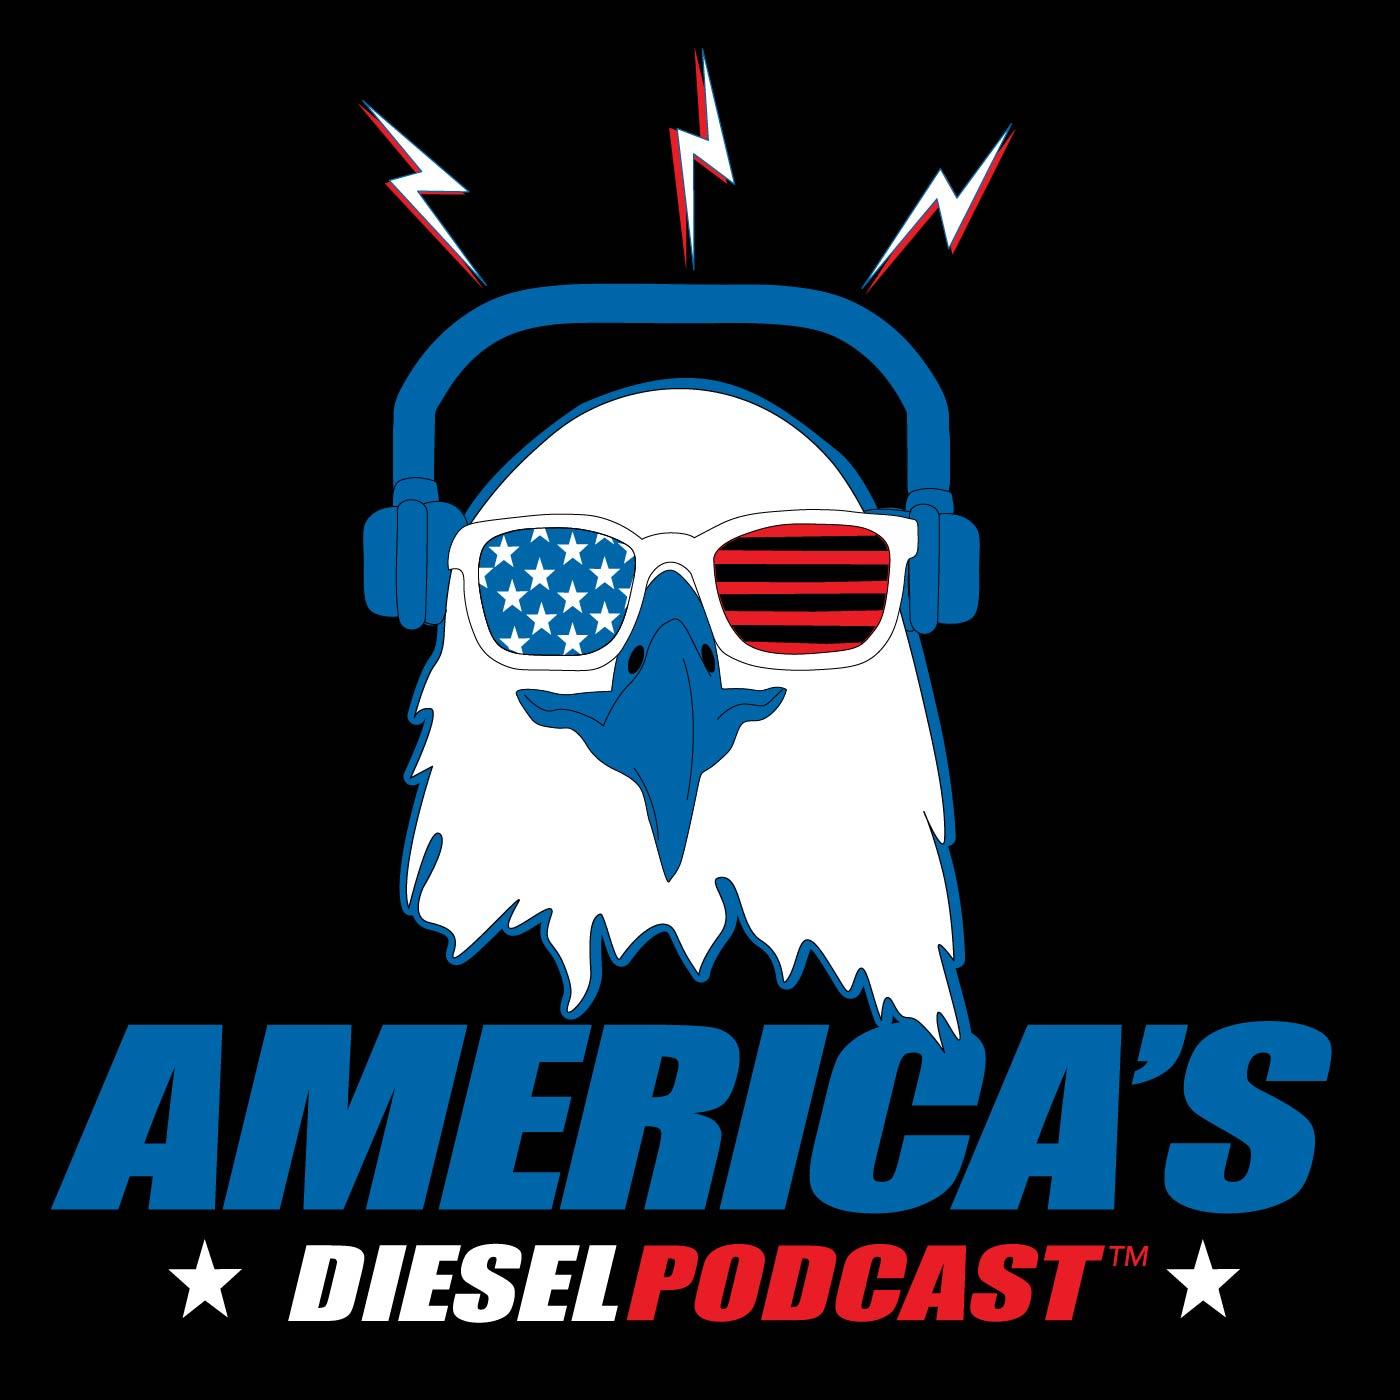 Americas Diesel Podcast